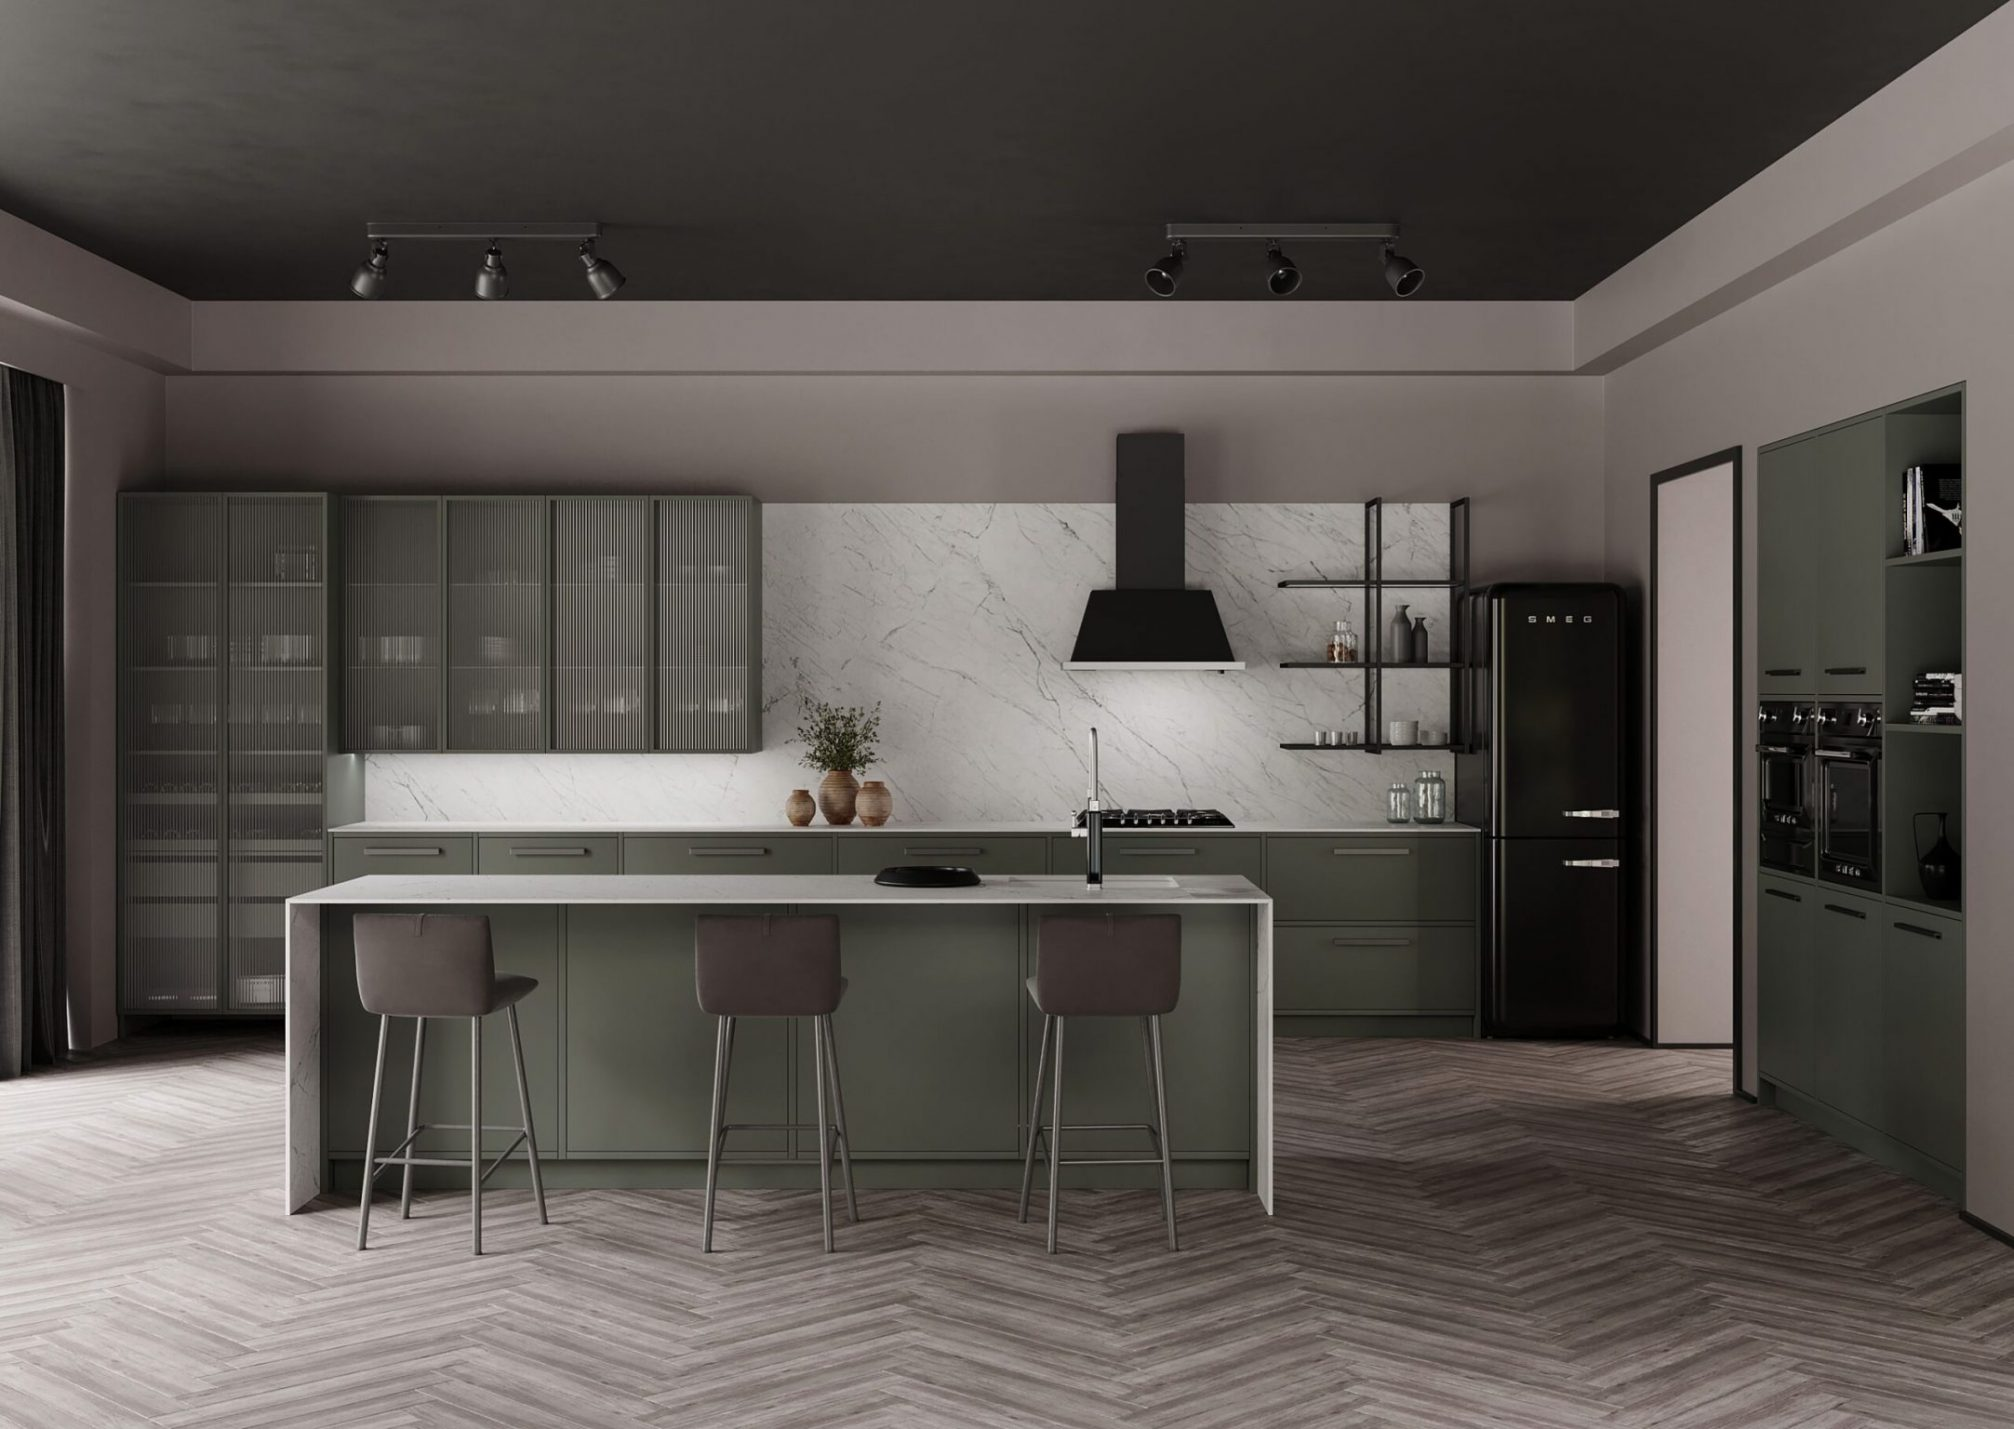 kitchen_studio_hygge_10-scaled